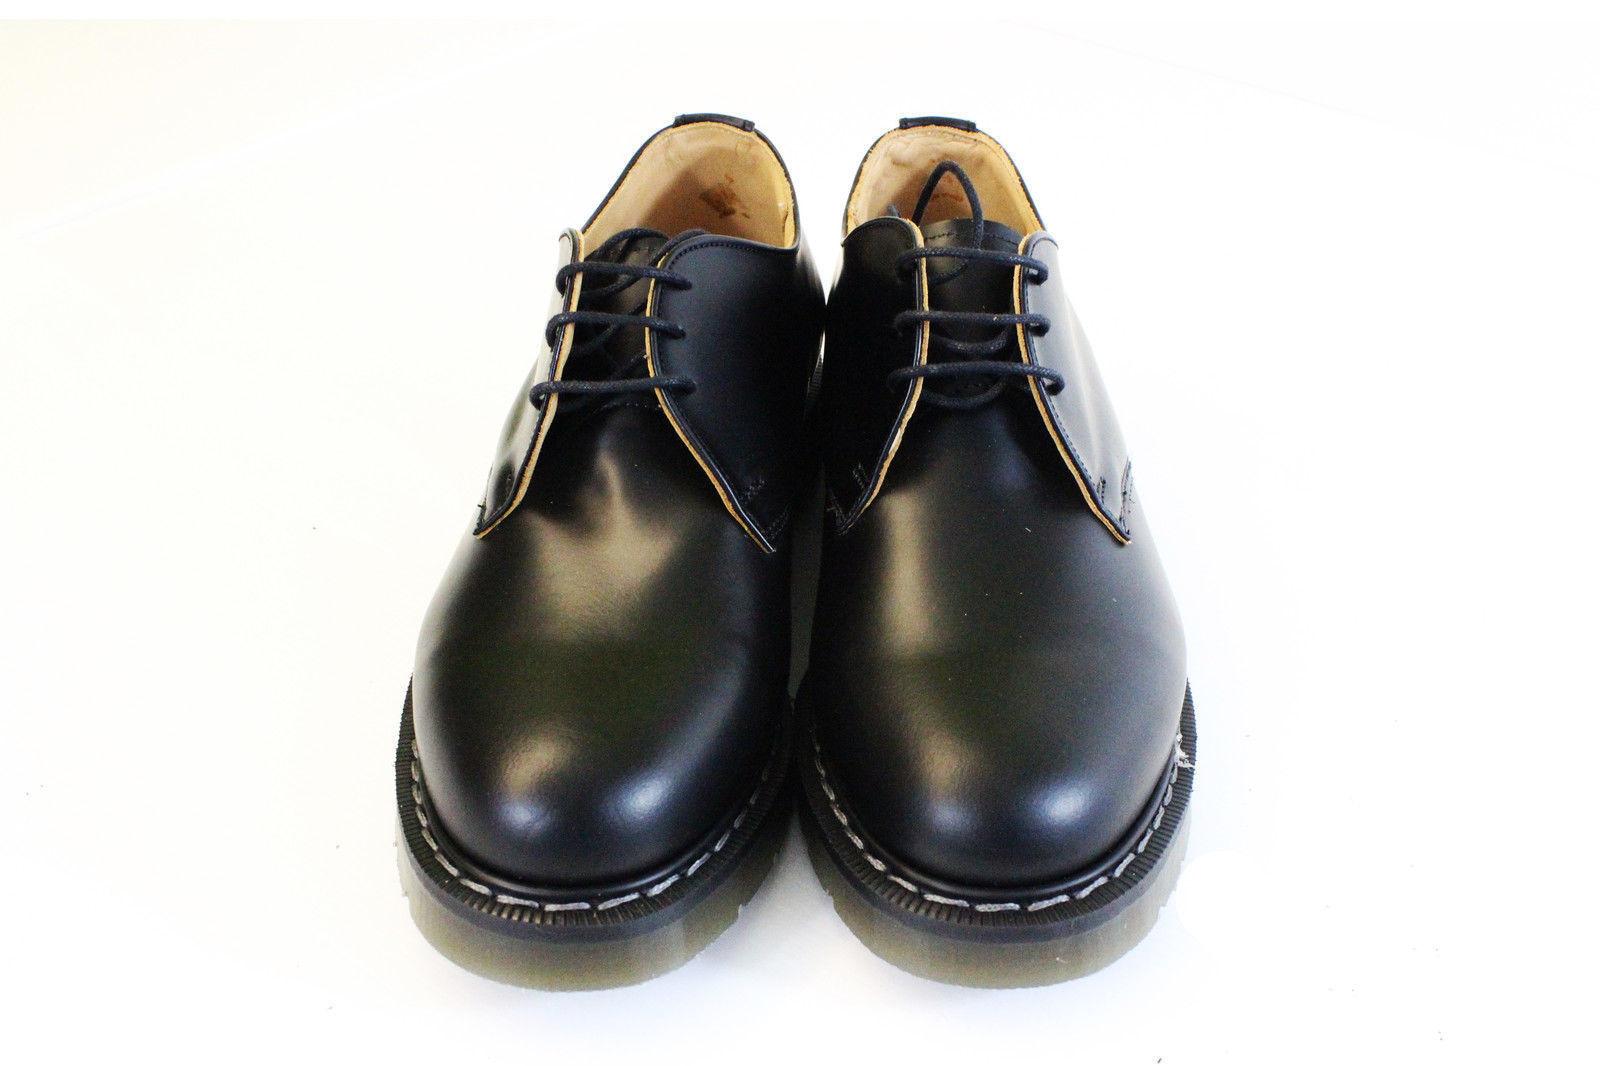 NORTHAMPTON MADE schwarz air cushion 3 3 3 eye gibson shoe Größe 7-11 1a1bfa